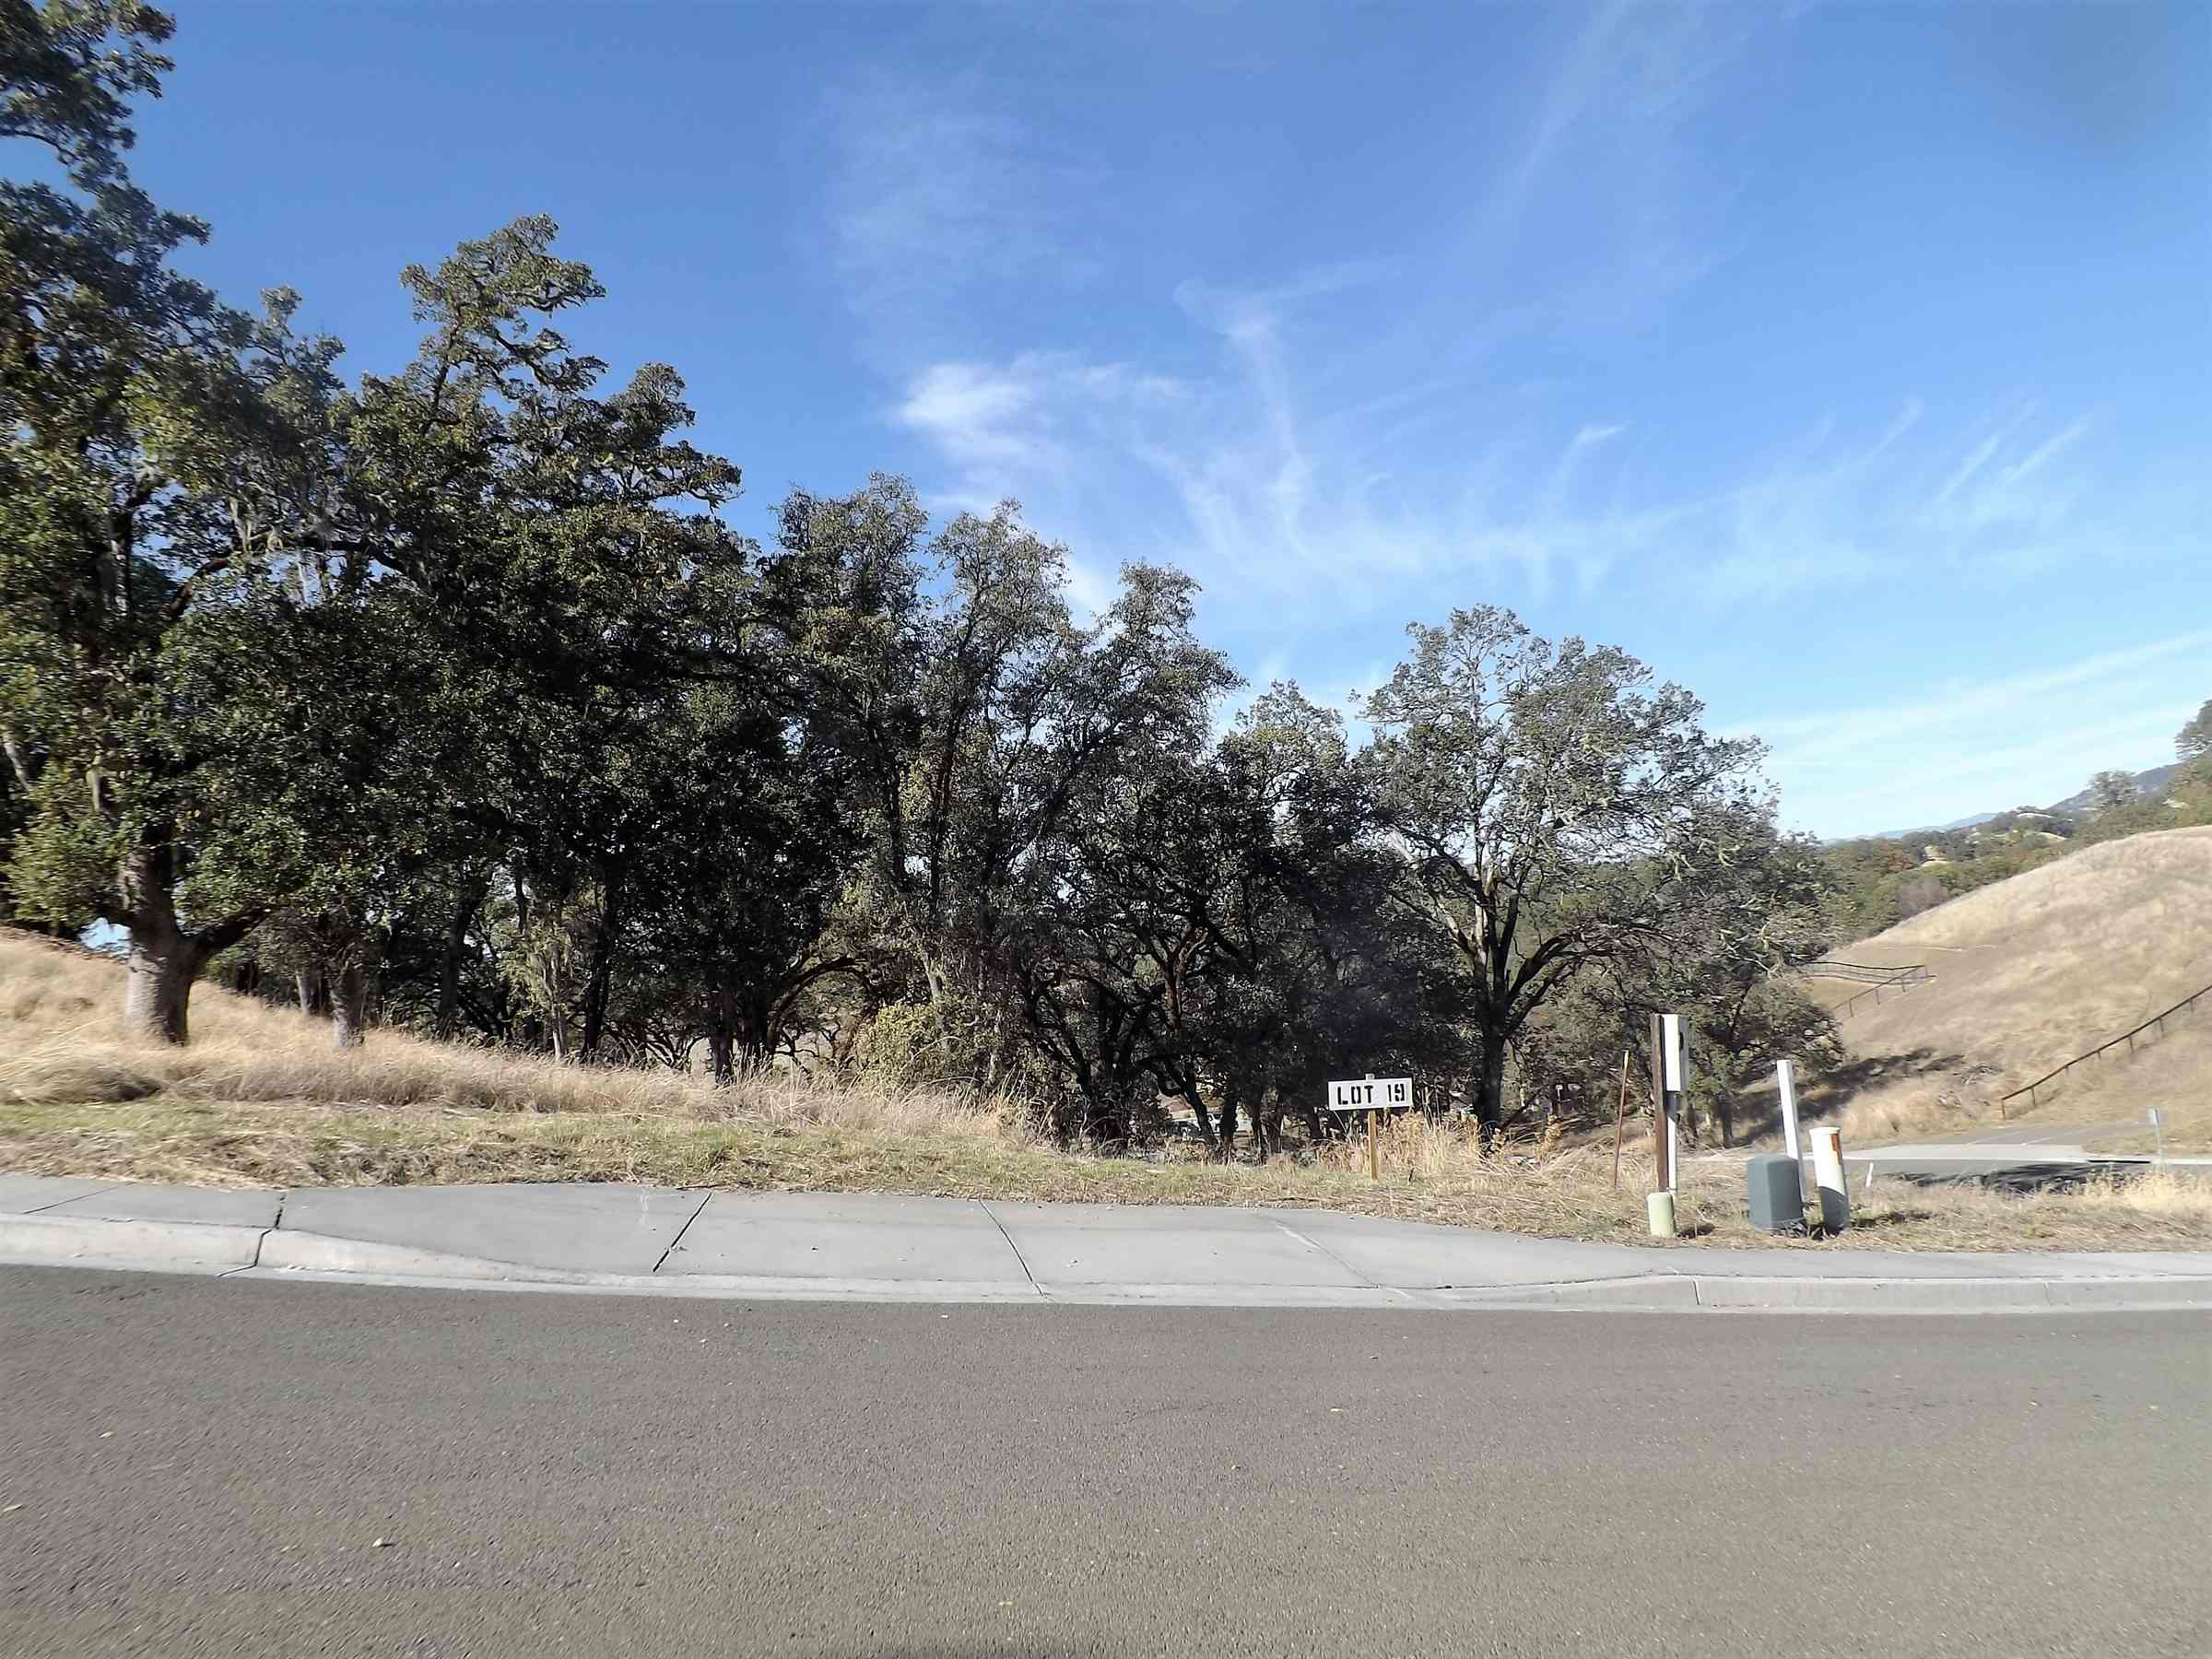 Photo of 450 Tehuacan Road  Ukiah  CA